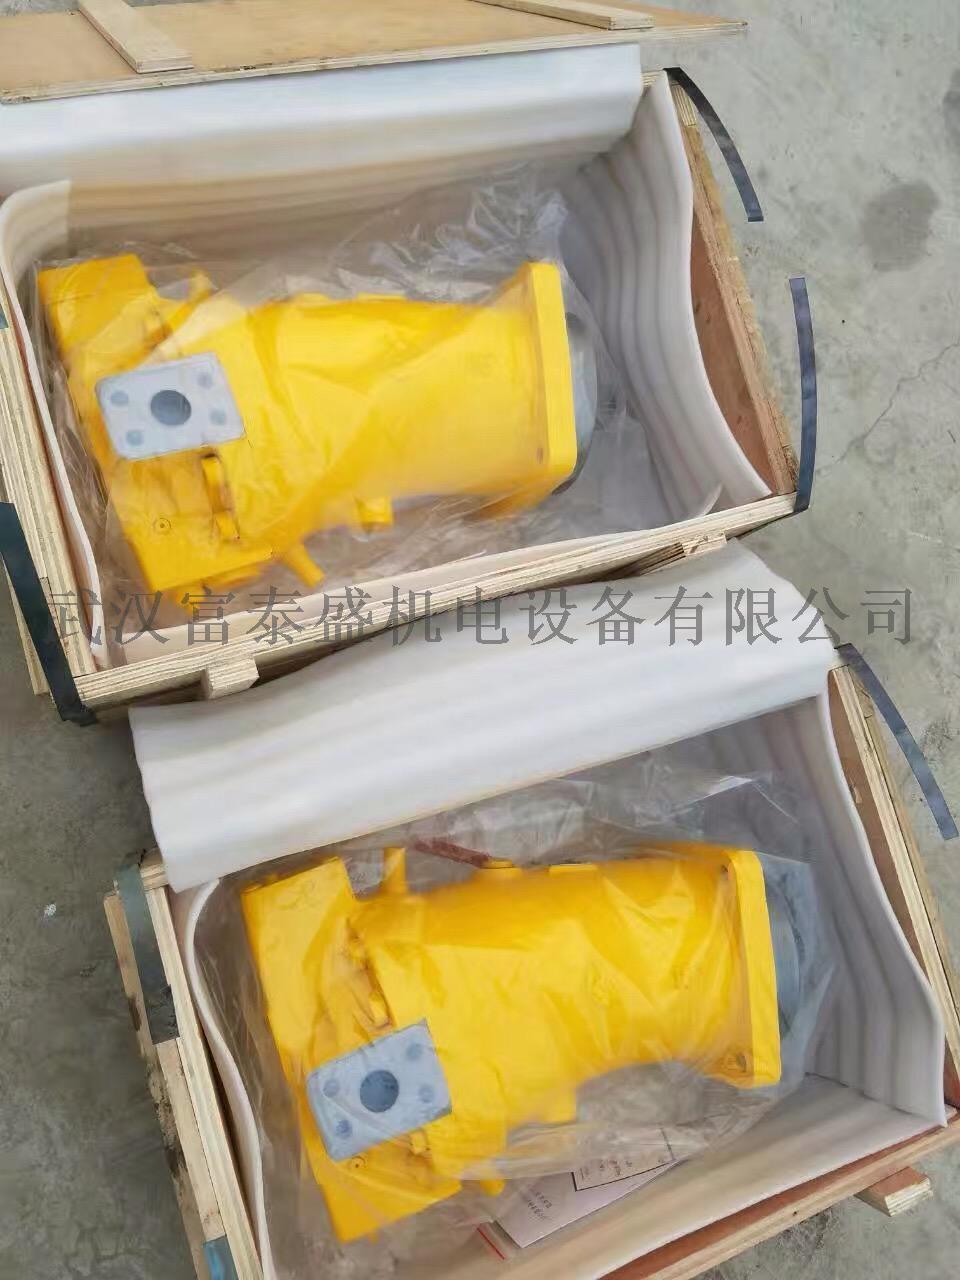 Y-A7V160LV2.0RZFH0 斜轴式柱塞泵厂家